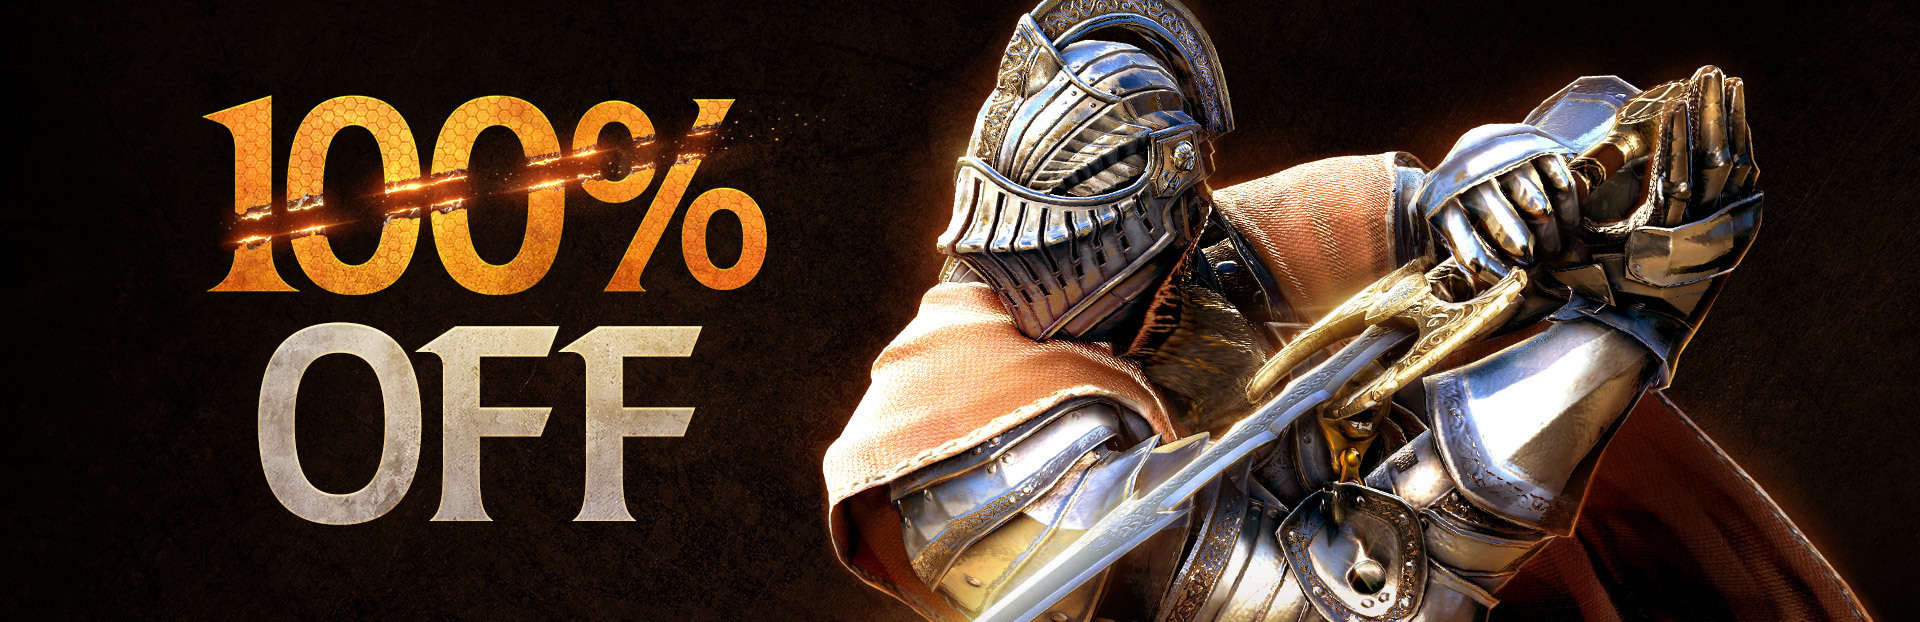 Black Desert Online Is Free On Steam Until March 10th 1